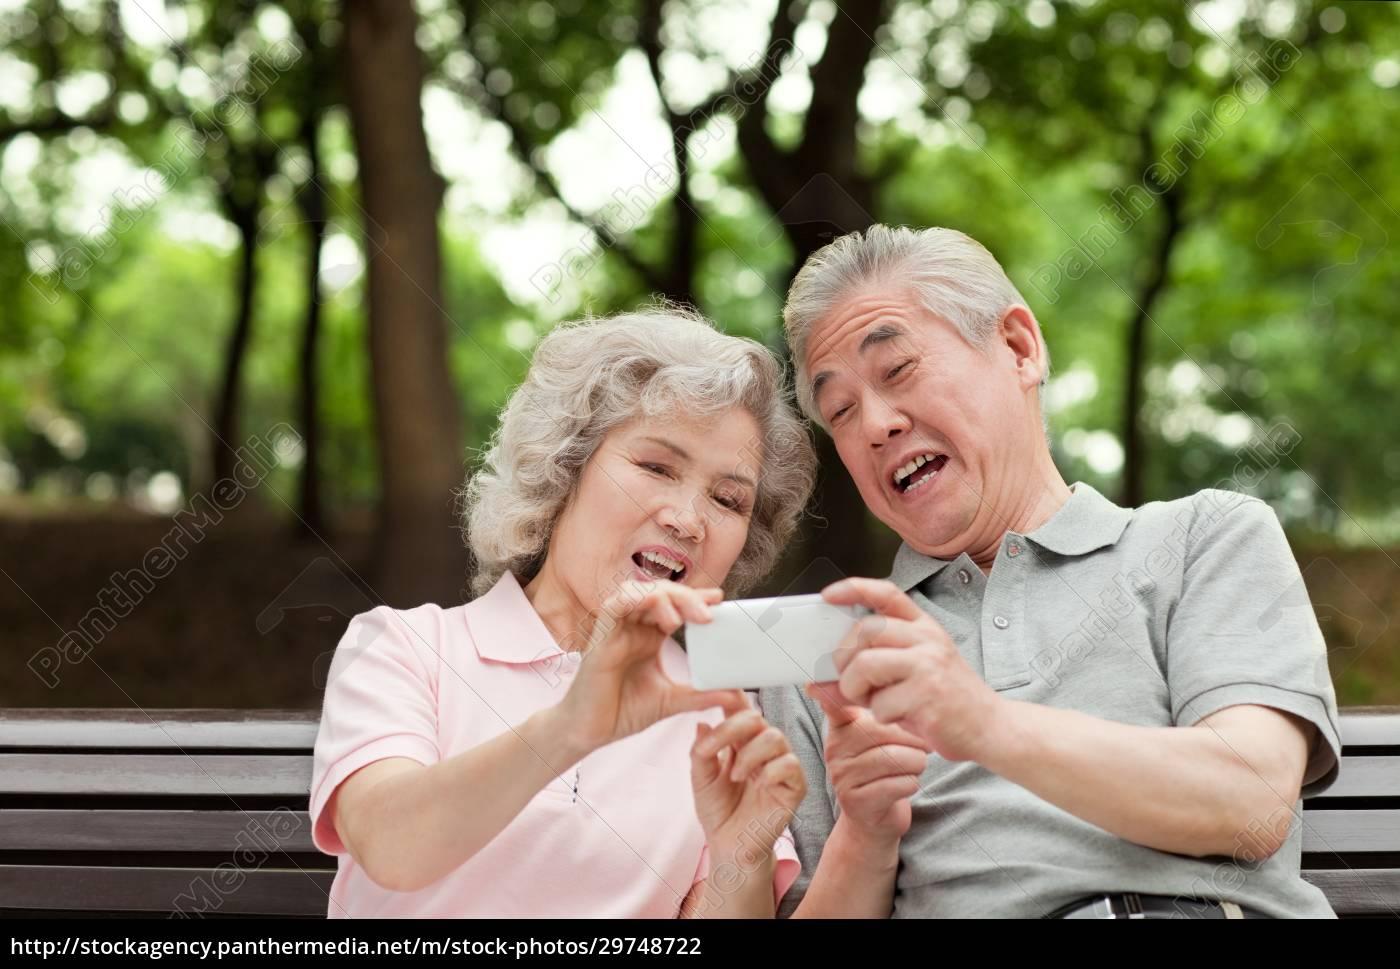 digitales, leben, älterer, menschen - 29748722